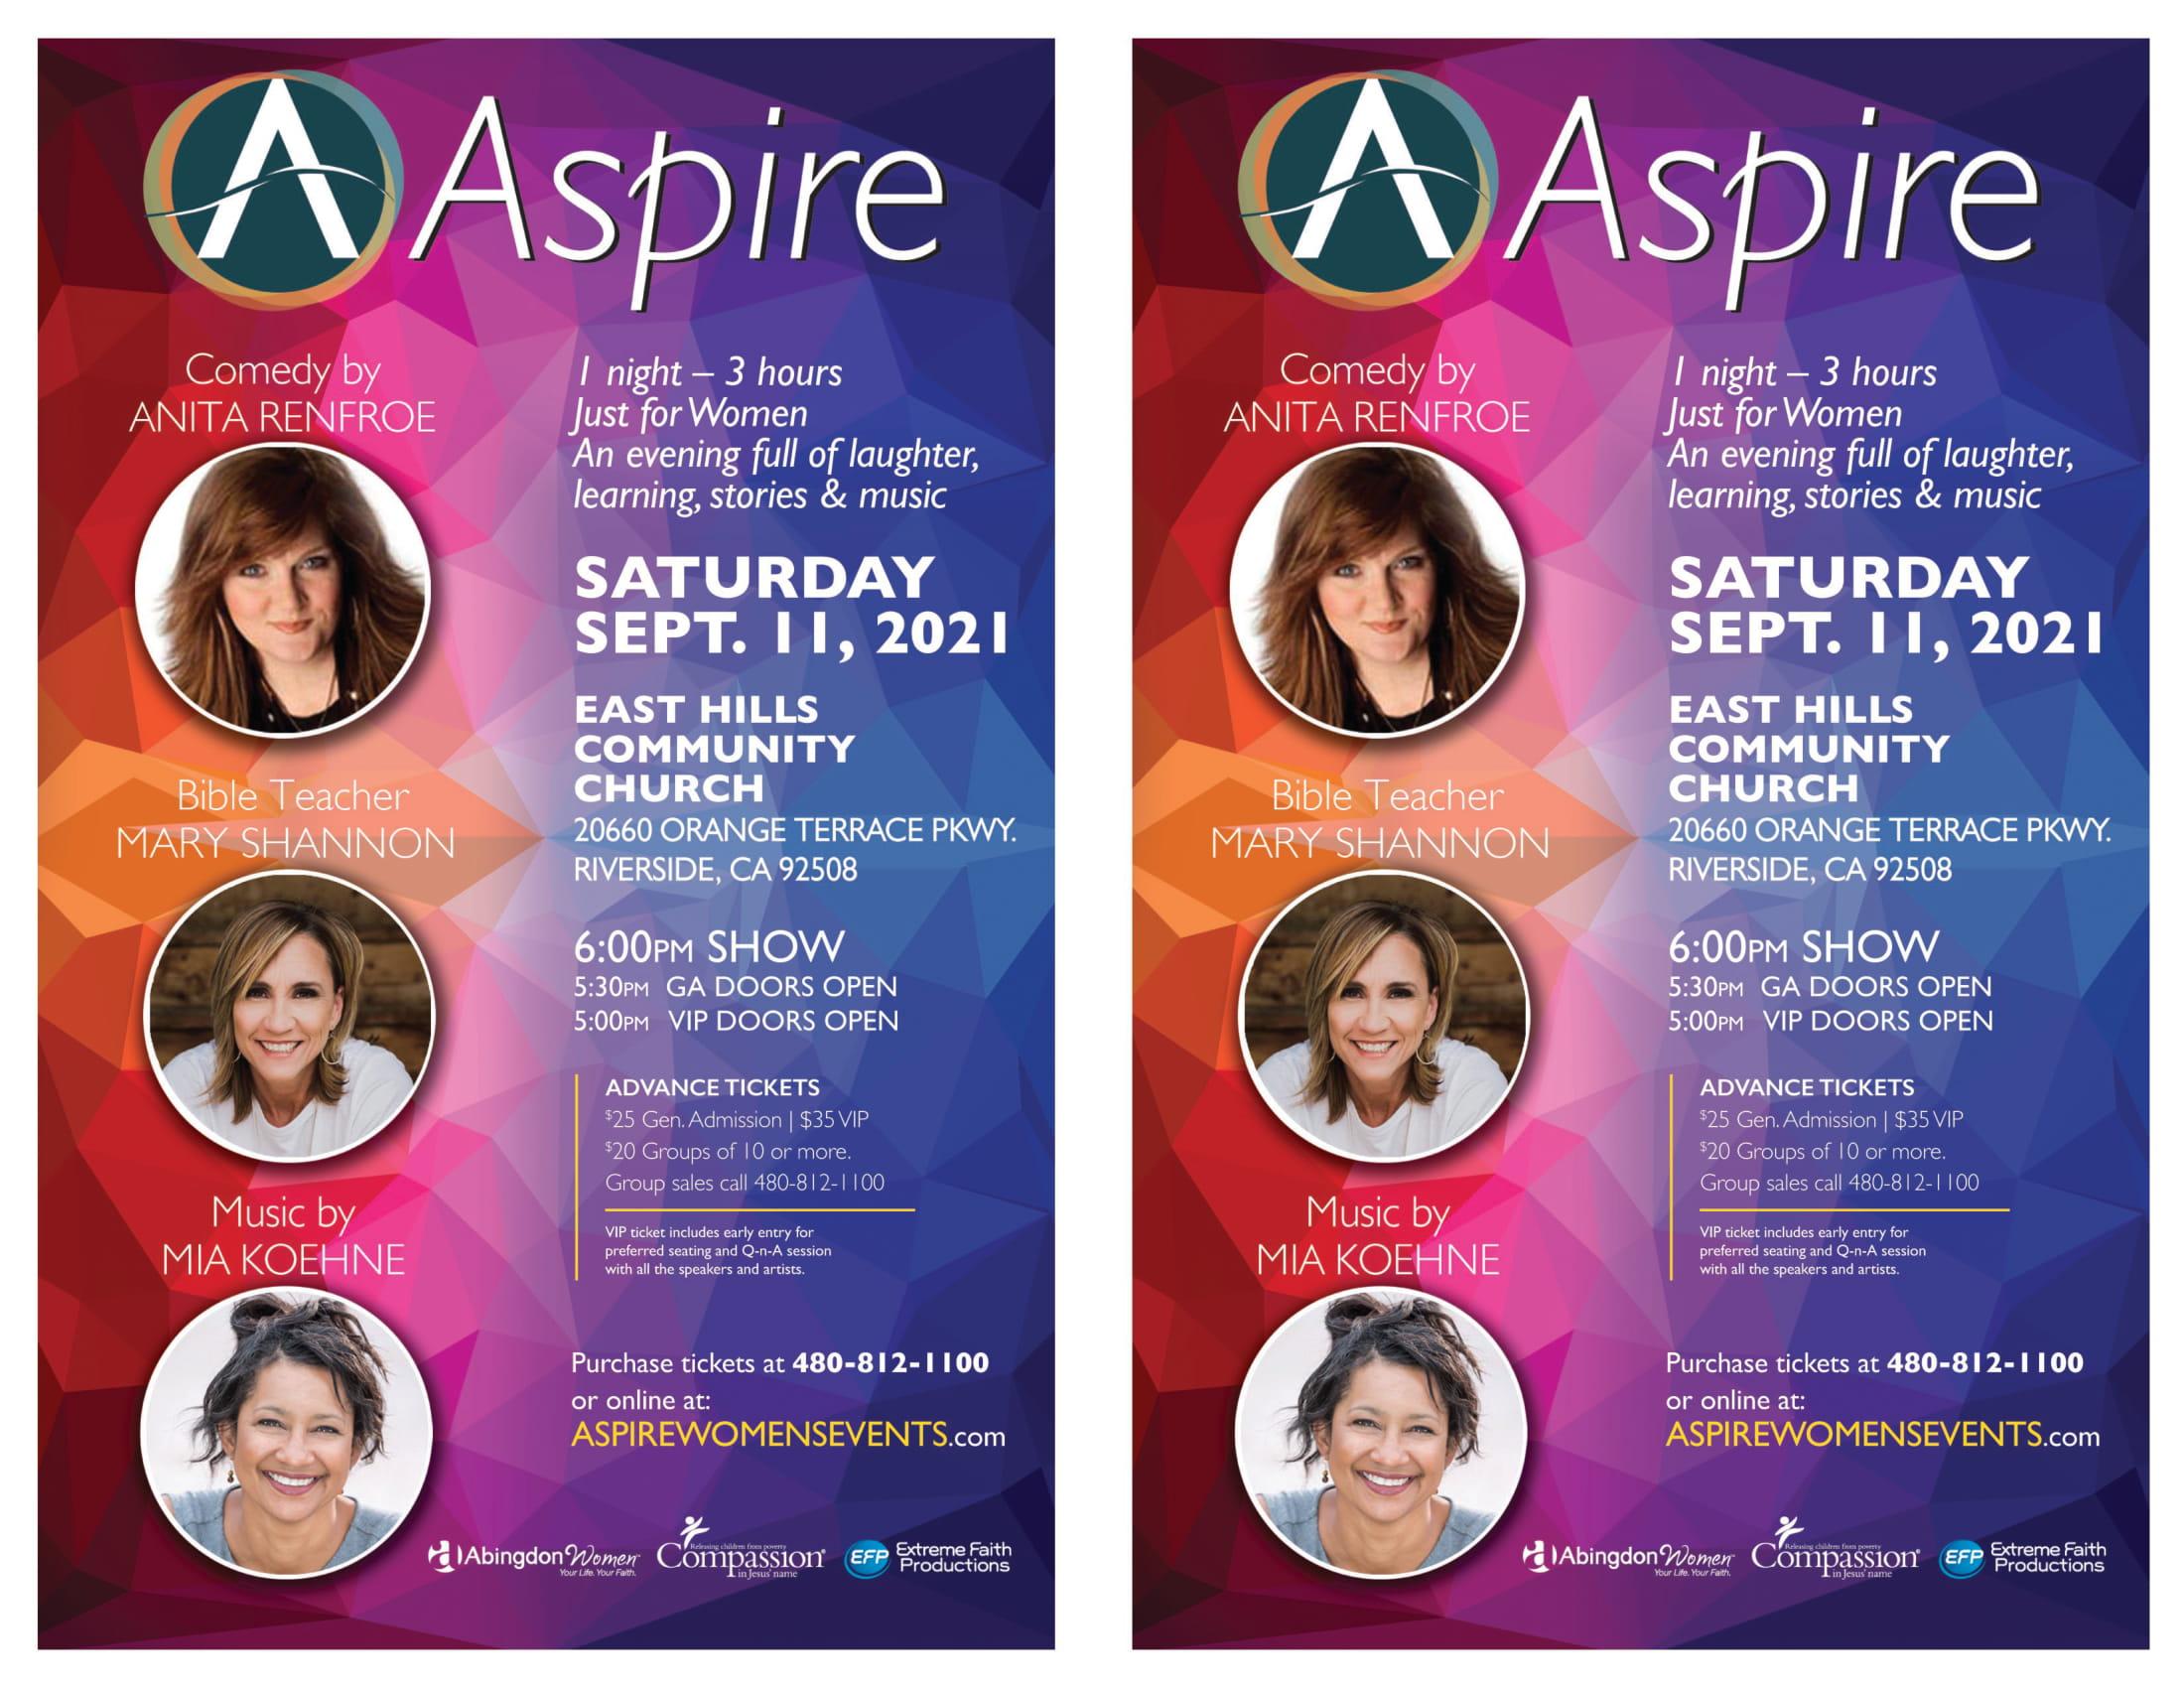 ASPIRE SAT Sept 11 Riverside CA-2UP-1